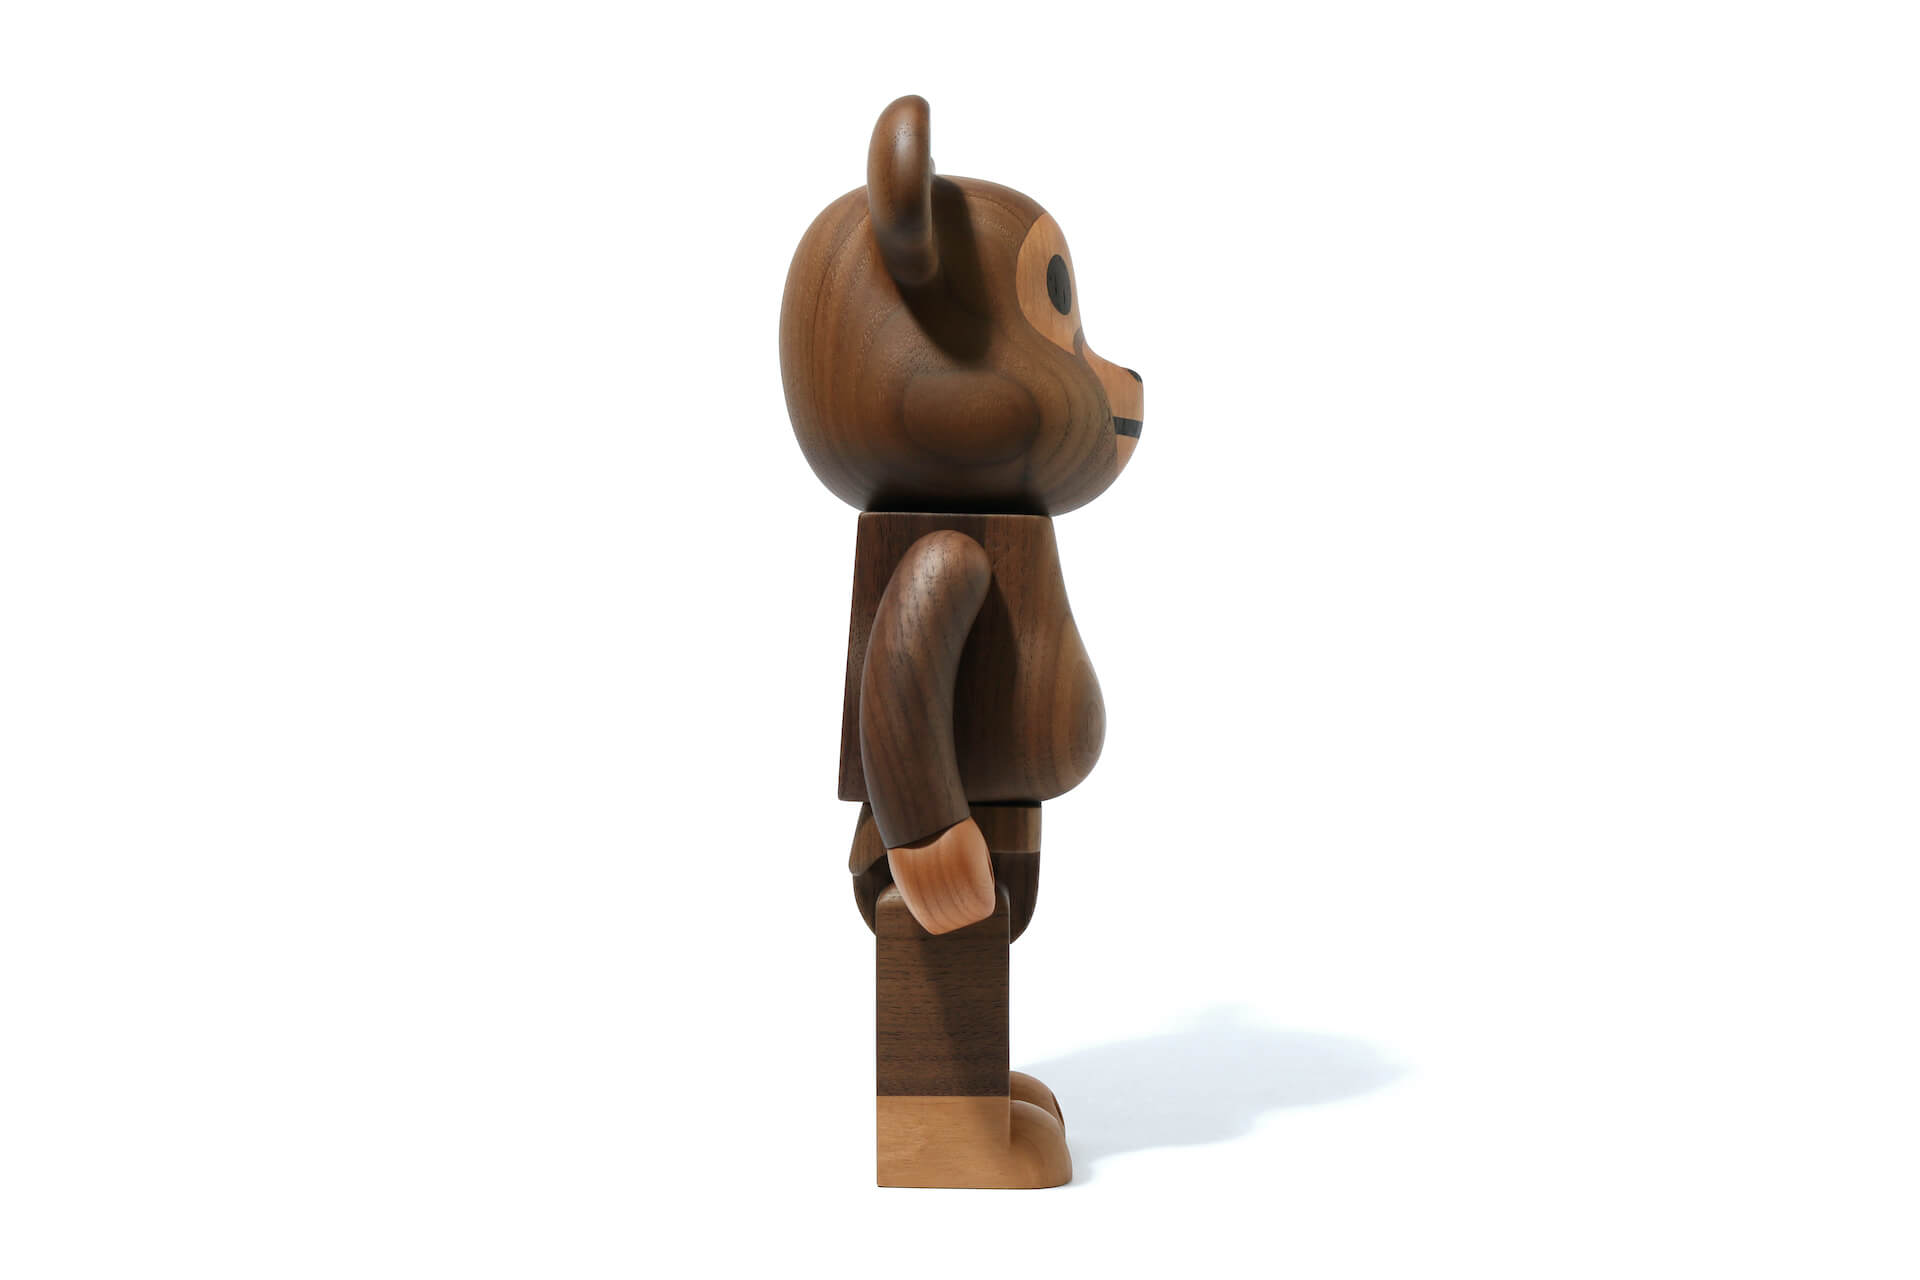 A BATHING APE(R)×カリモク×メディコム・トイのトリプルコラボ!BABY MILO(R)の木製BE@RBRICKが登場 ac200526_bearbrick_05